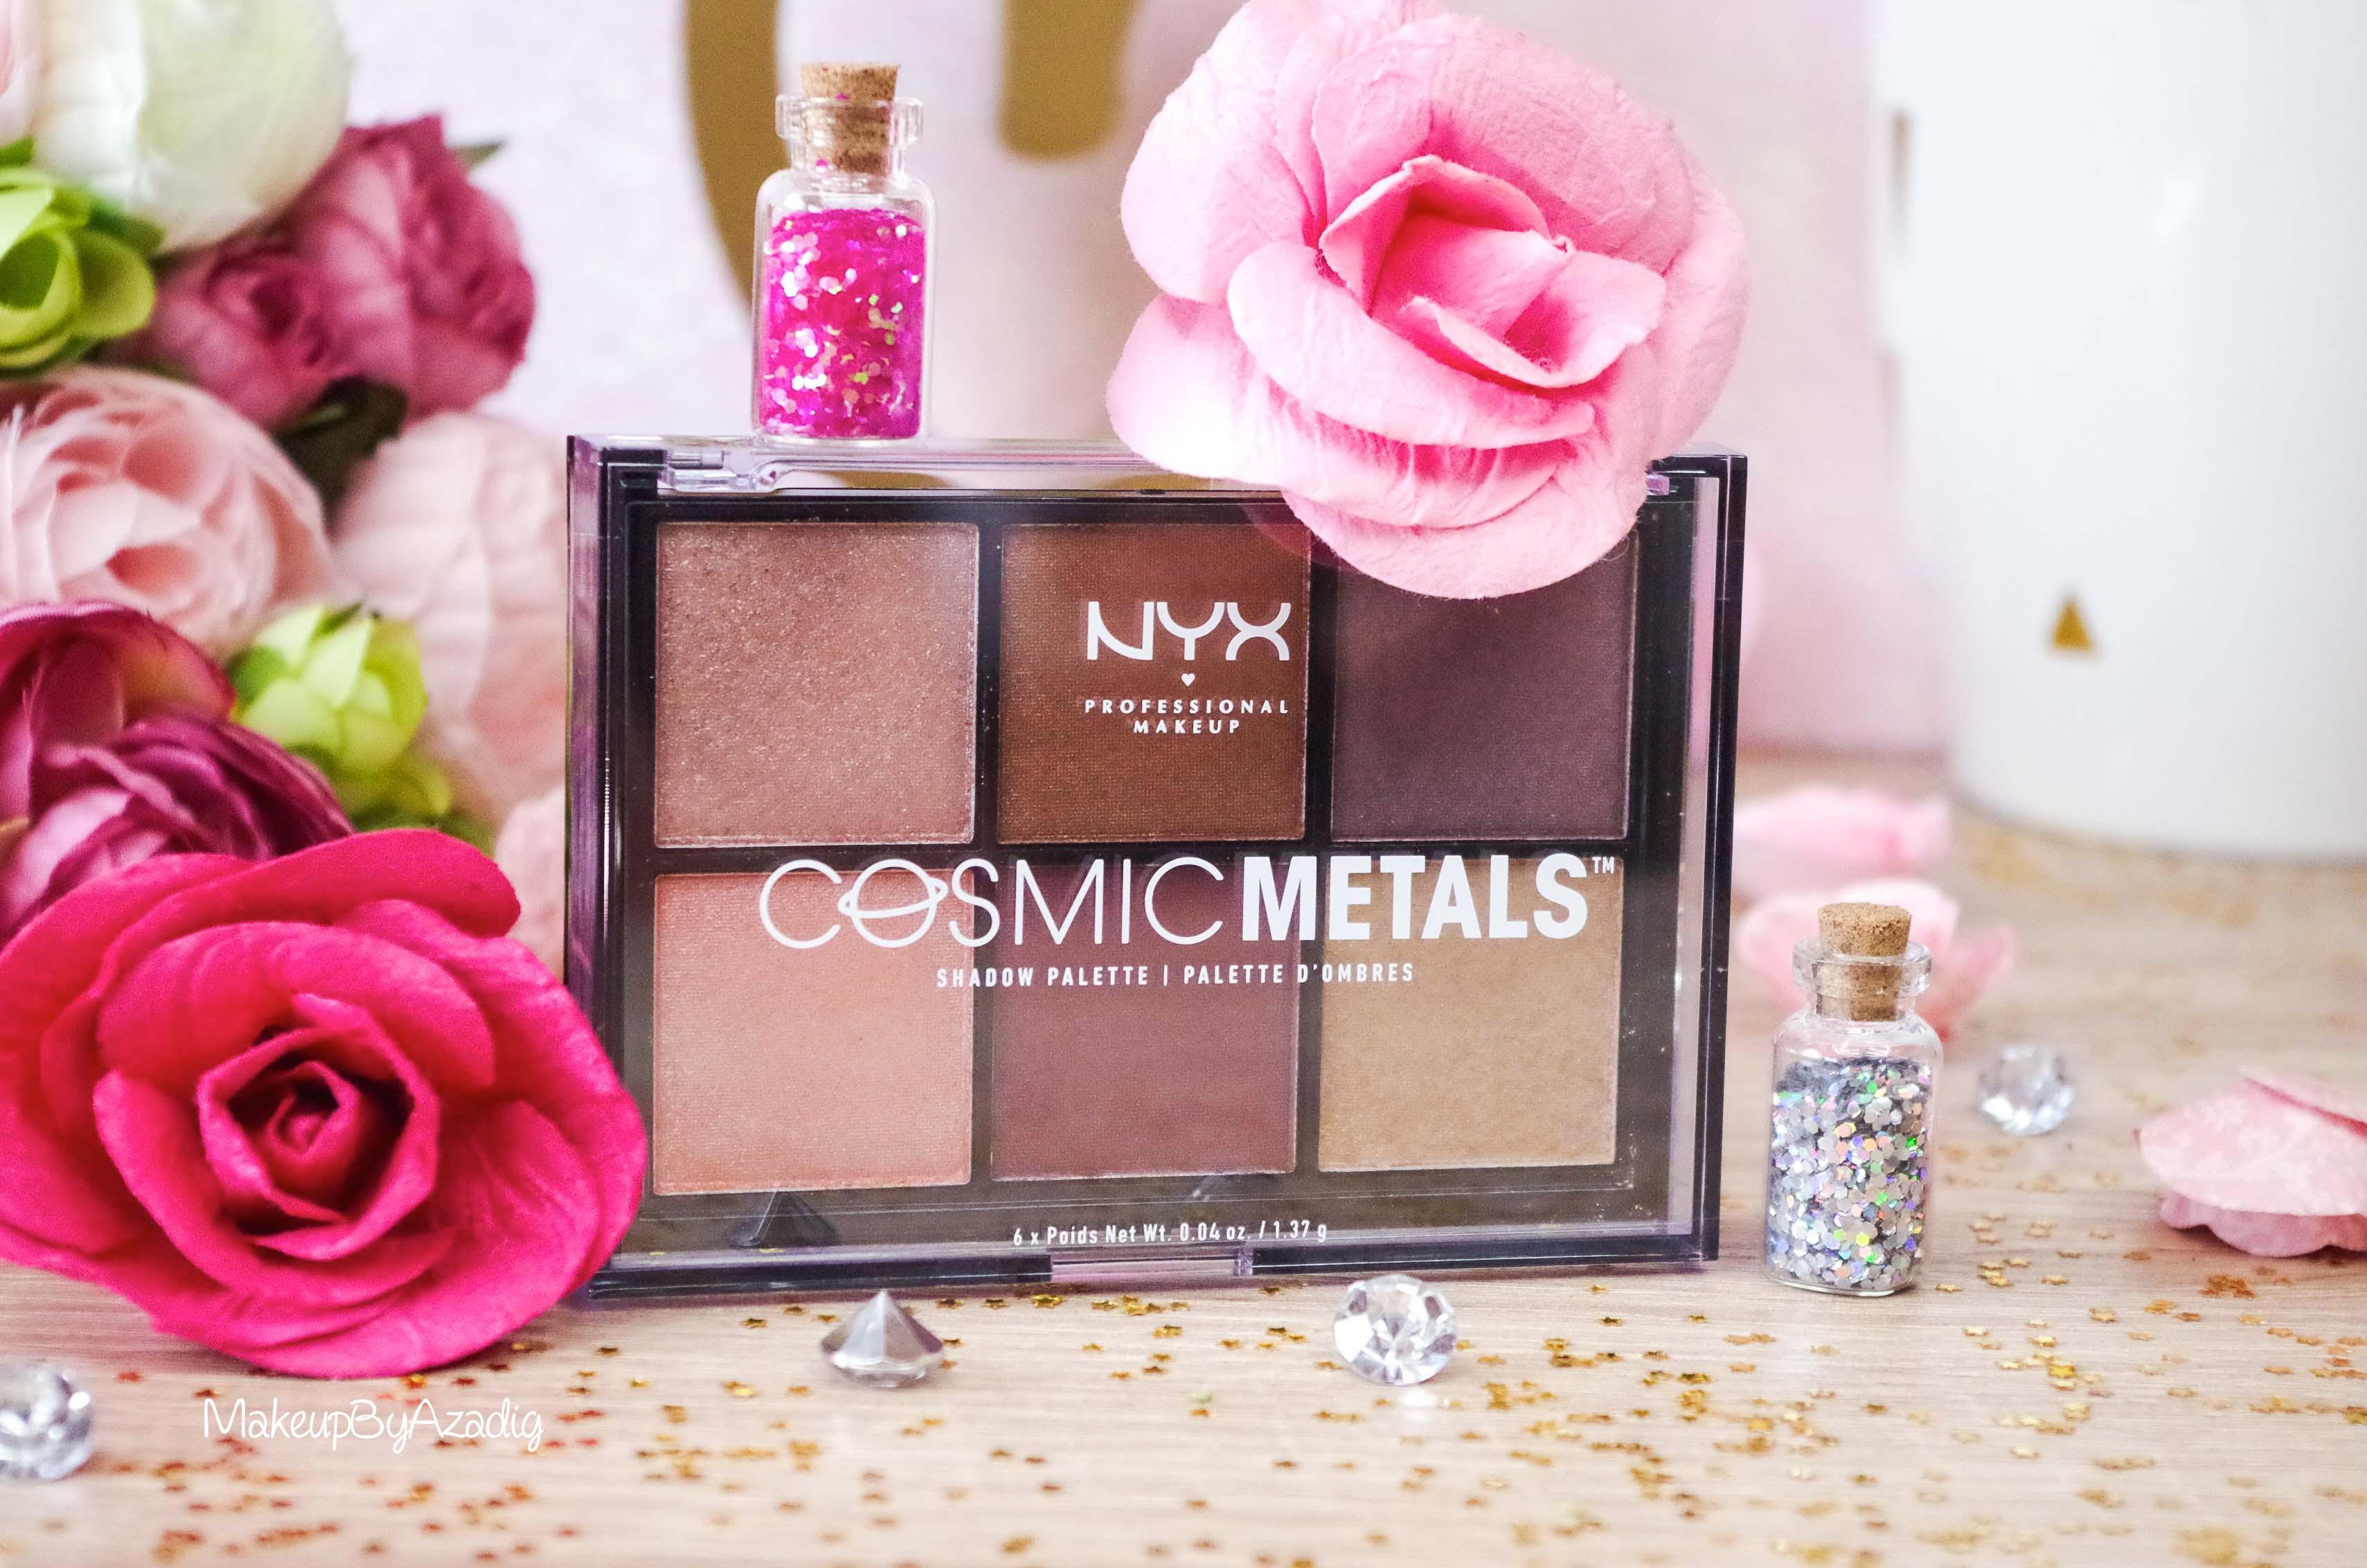 revue-palette-fards-paupieres-cosmic-metals-nyx-cosmetics-pas-cher-meilleure-makeupbyazadig-influencer-avis